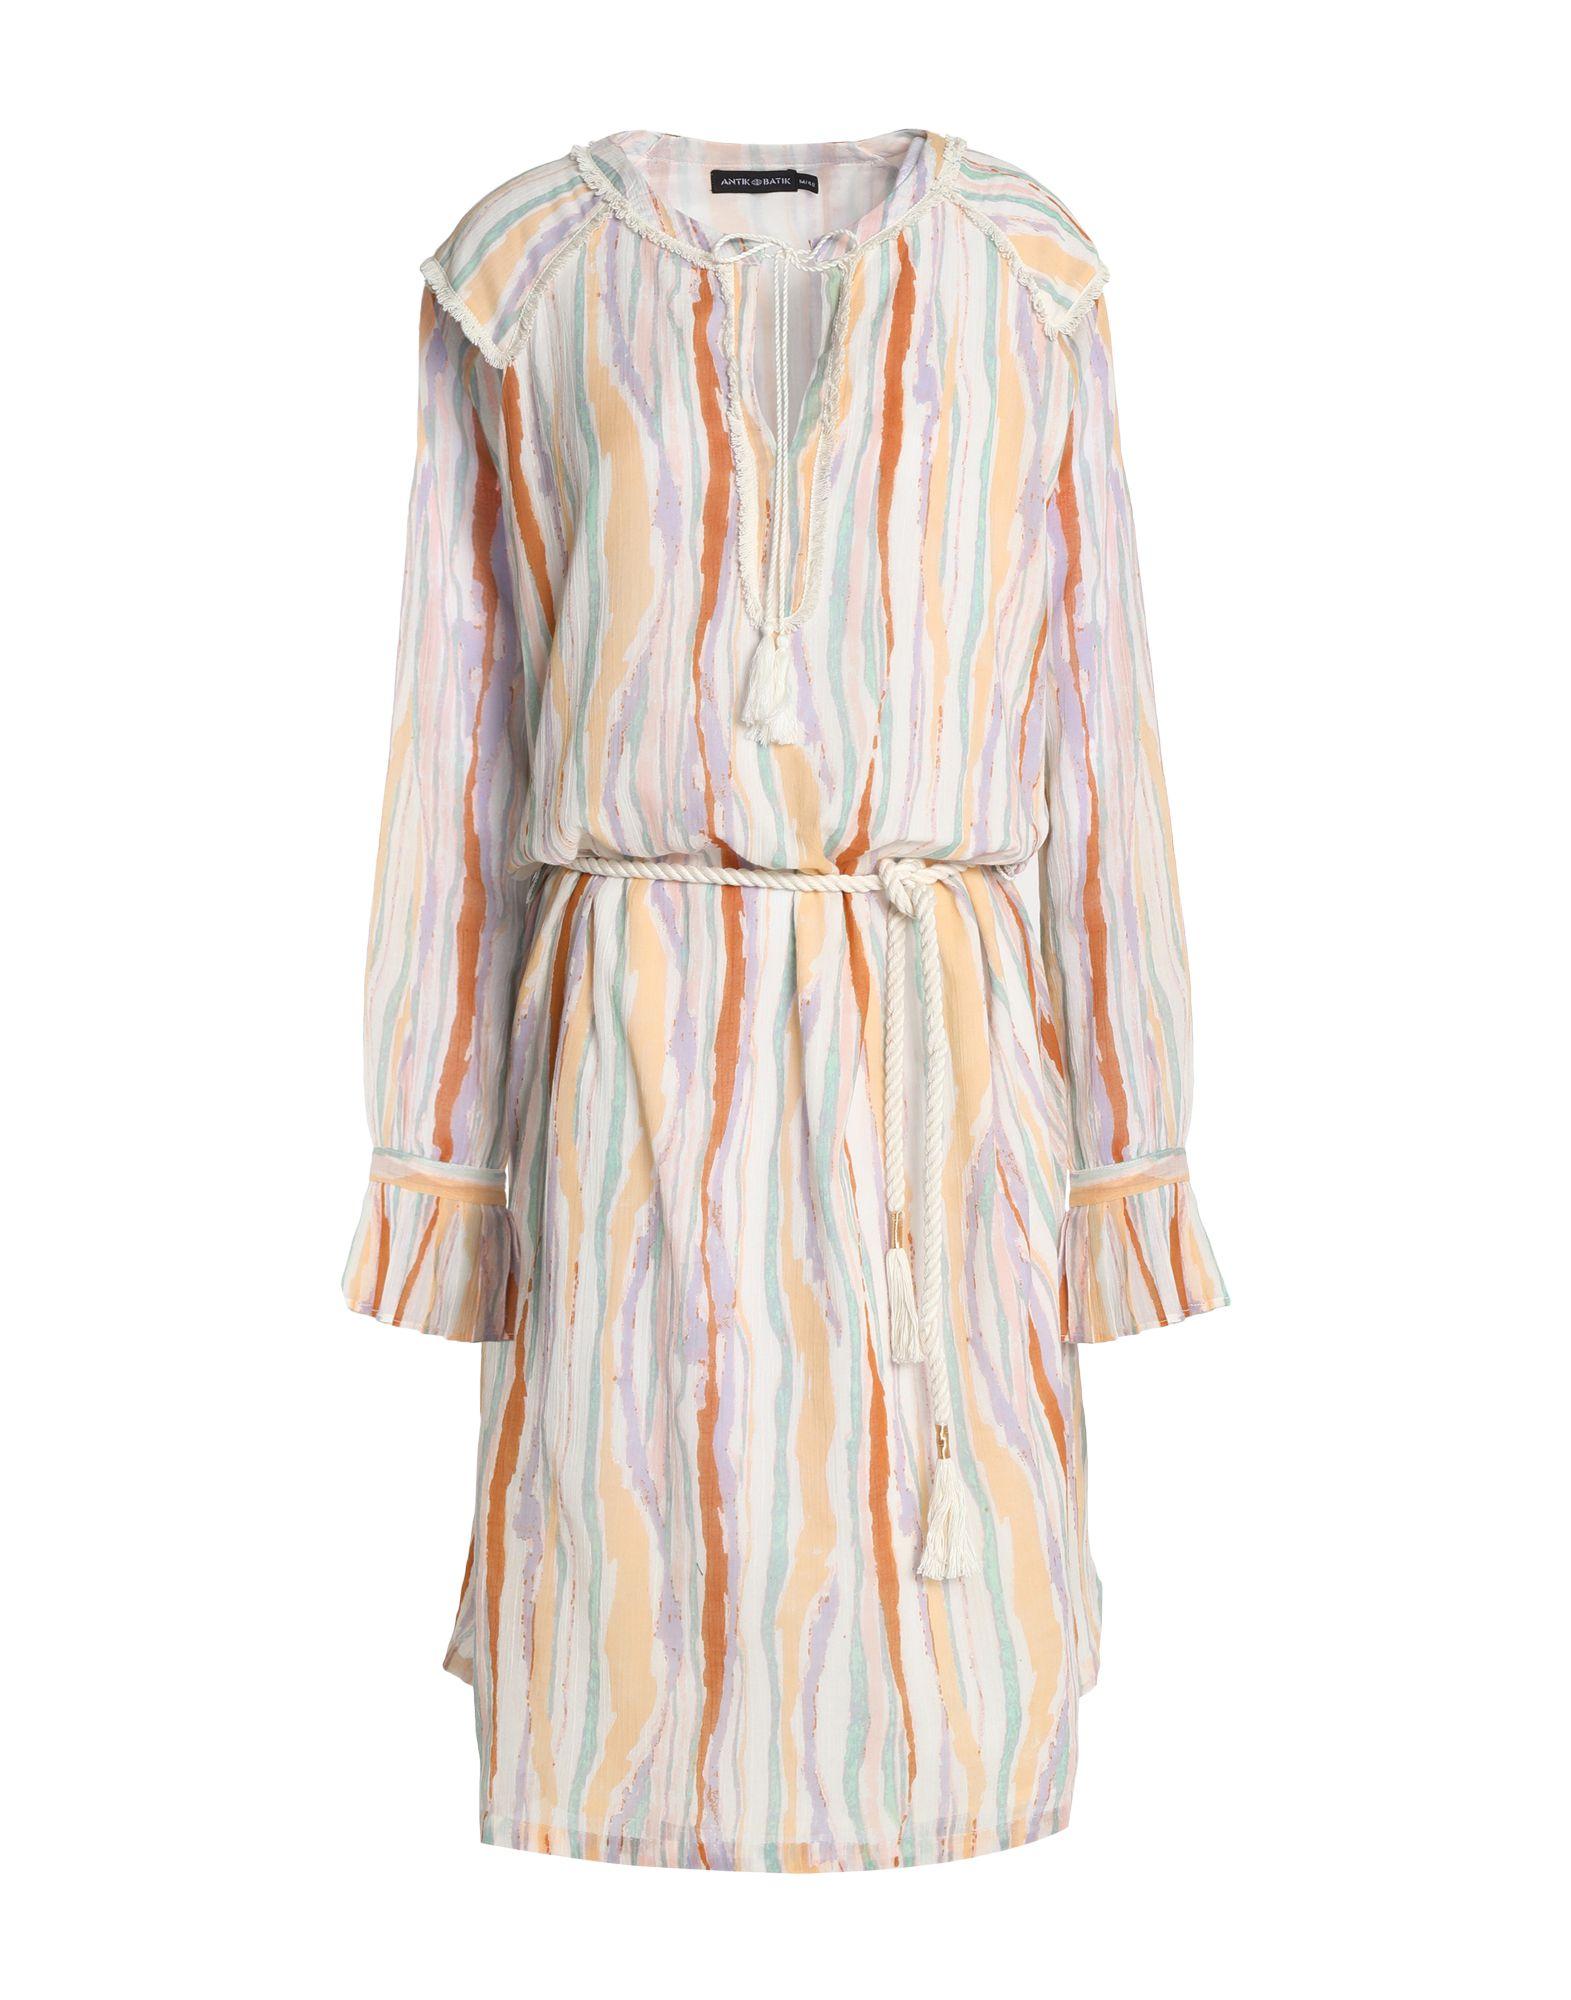 ANTIK BATIK Платье до колена batik batik зимний комплект маруся 350 200гр сиреневый